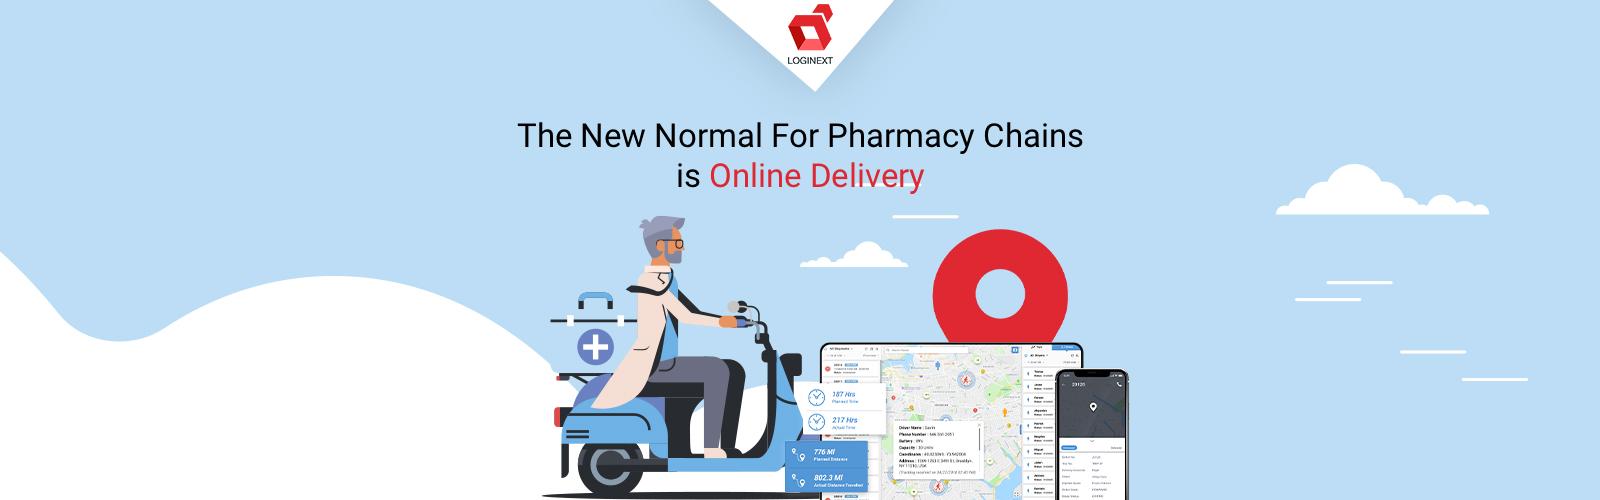 LogiNext helps pharmacies go digital as 'Medicine eCommerce' goes up 40%